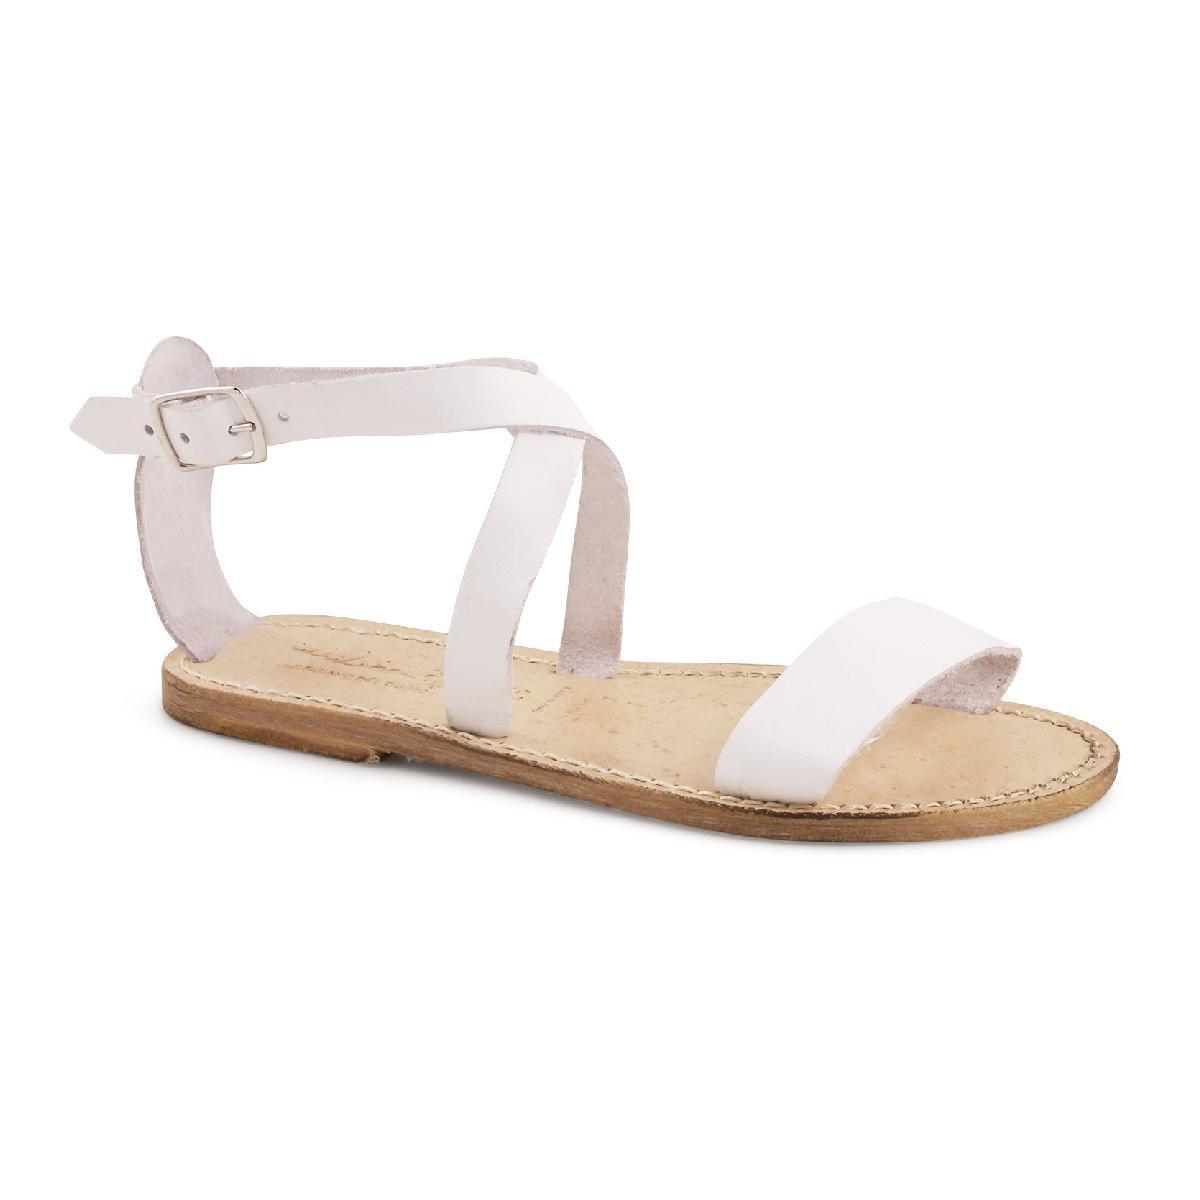 Creative Saint Laurent Womens Tan Strappy Flat Leather Sandals  Cofov